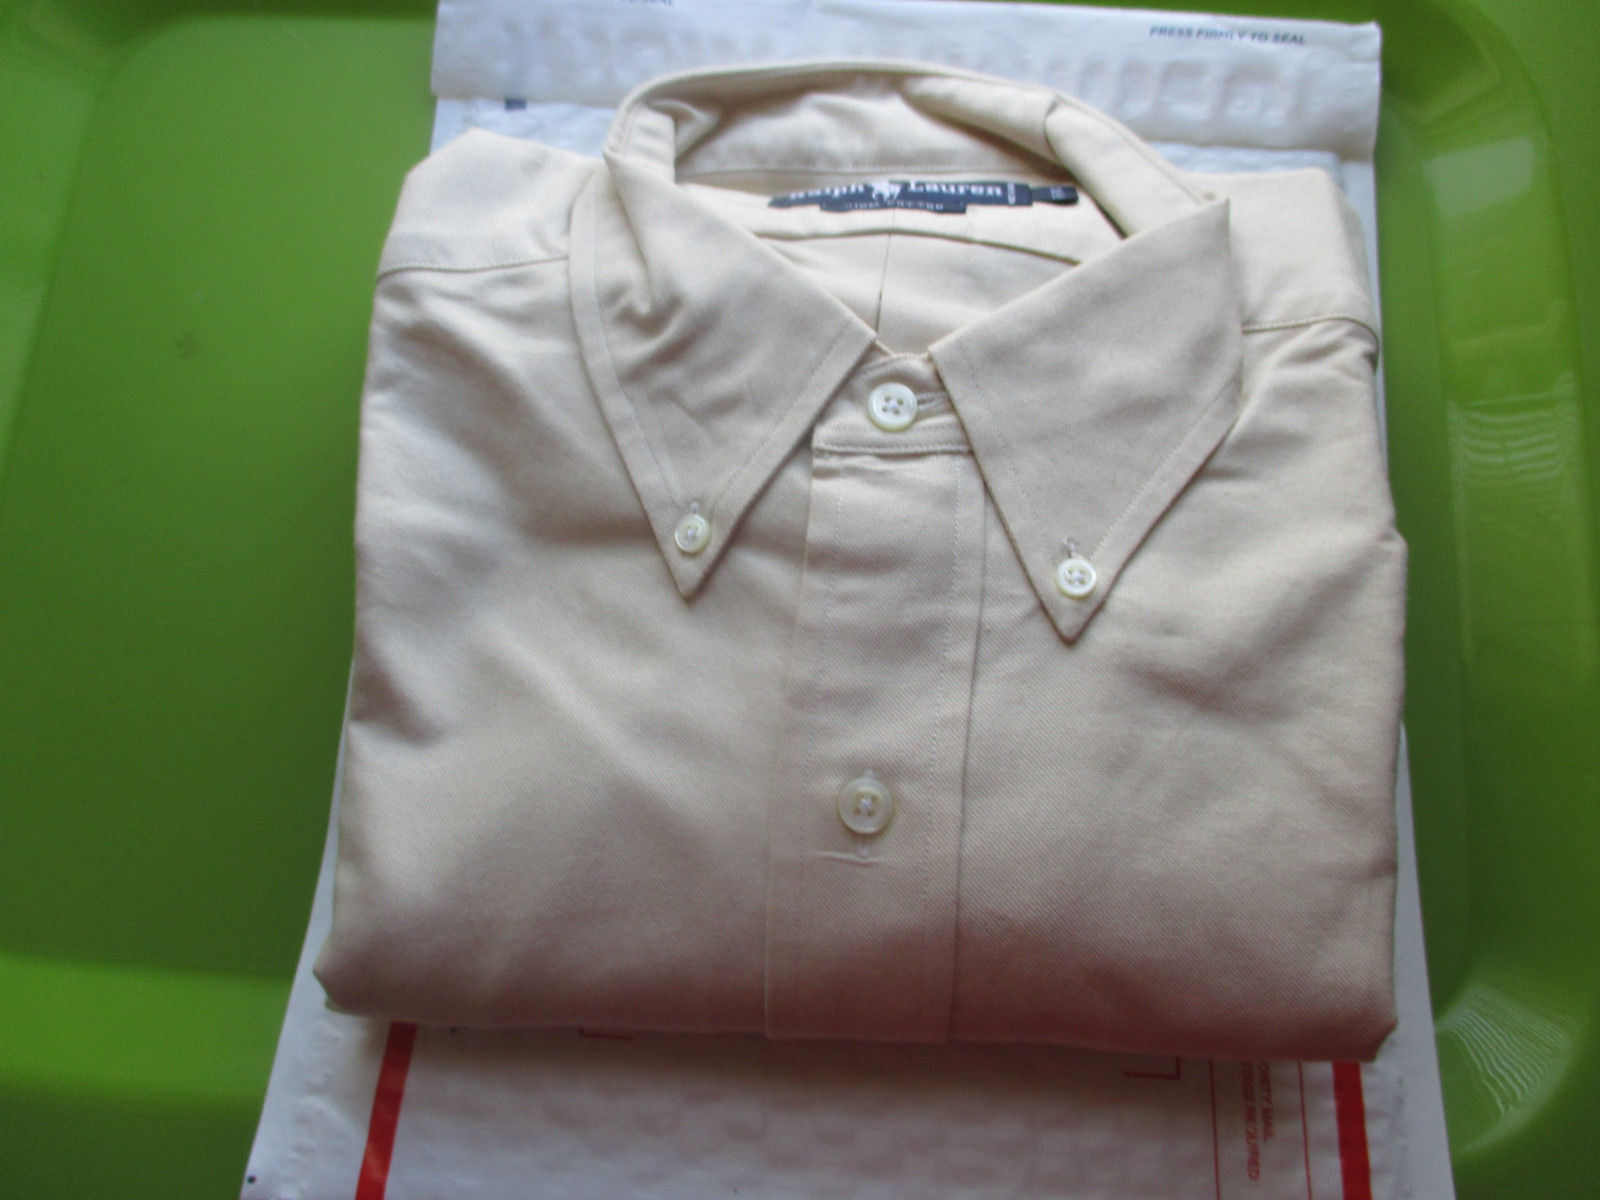 f7c05a81 S l1600. S l1600. Previous. Ralph Lauren Men's Long Sleeve button down  shirt Size 16-34 NWOT